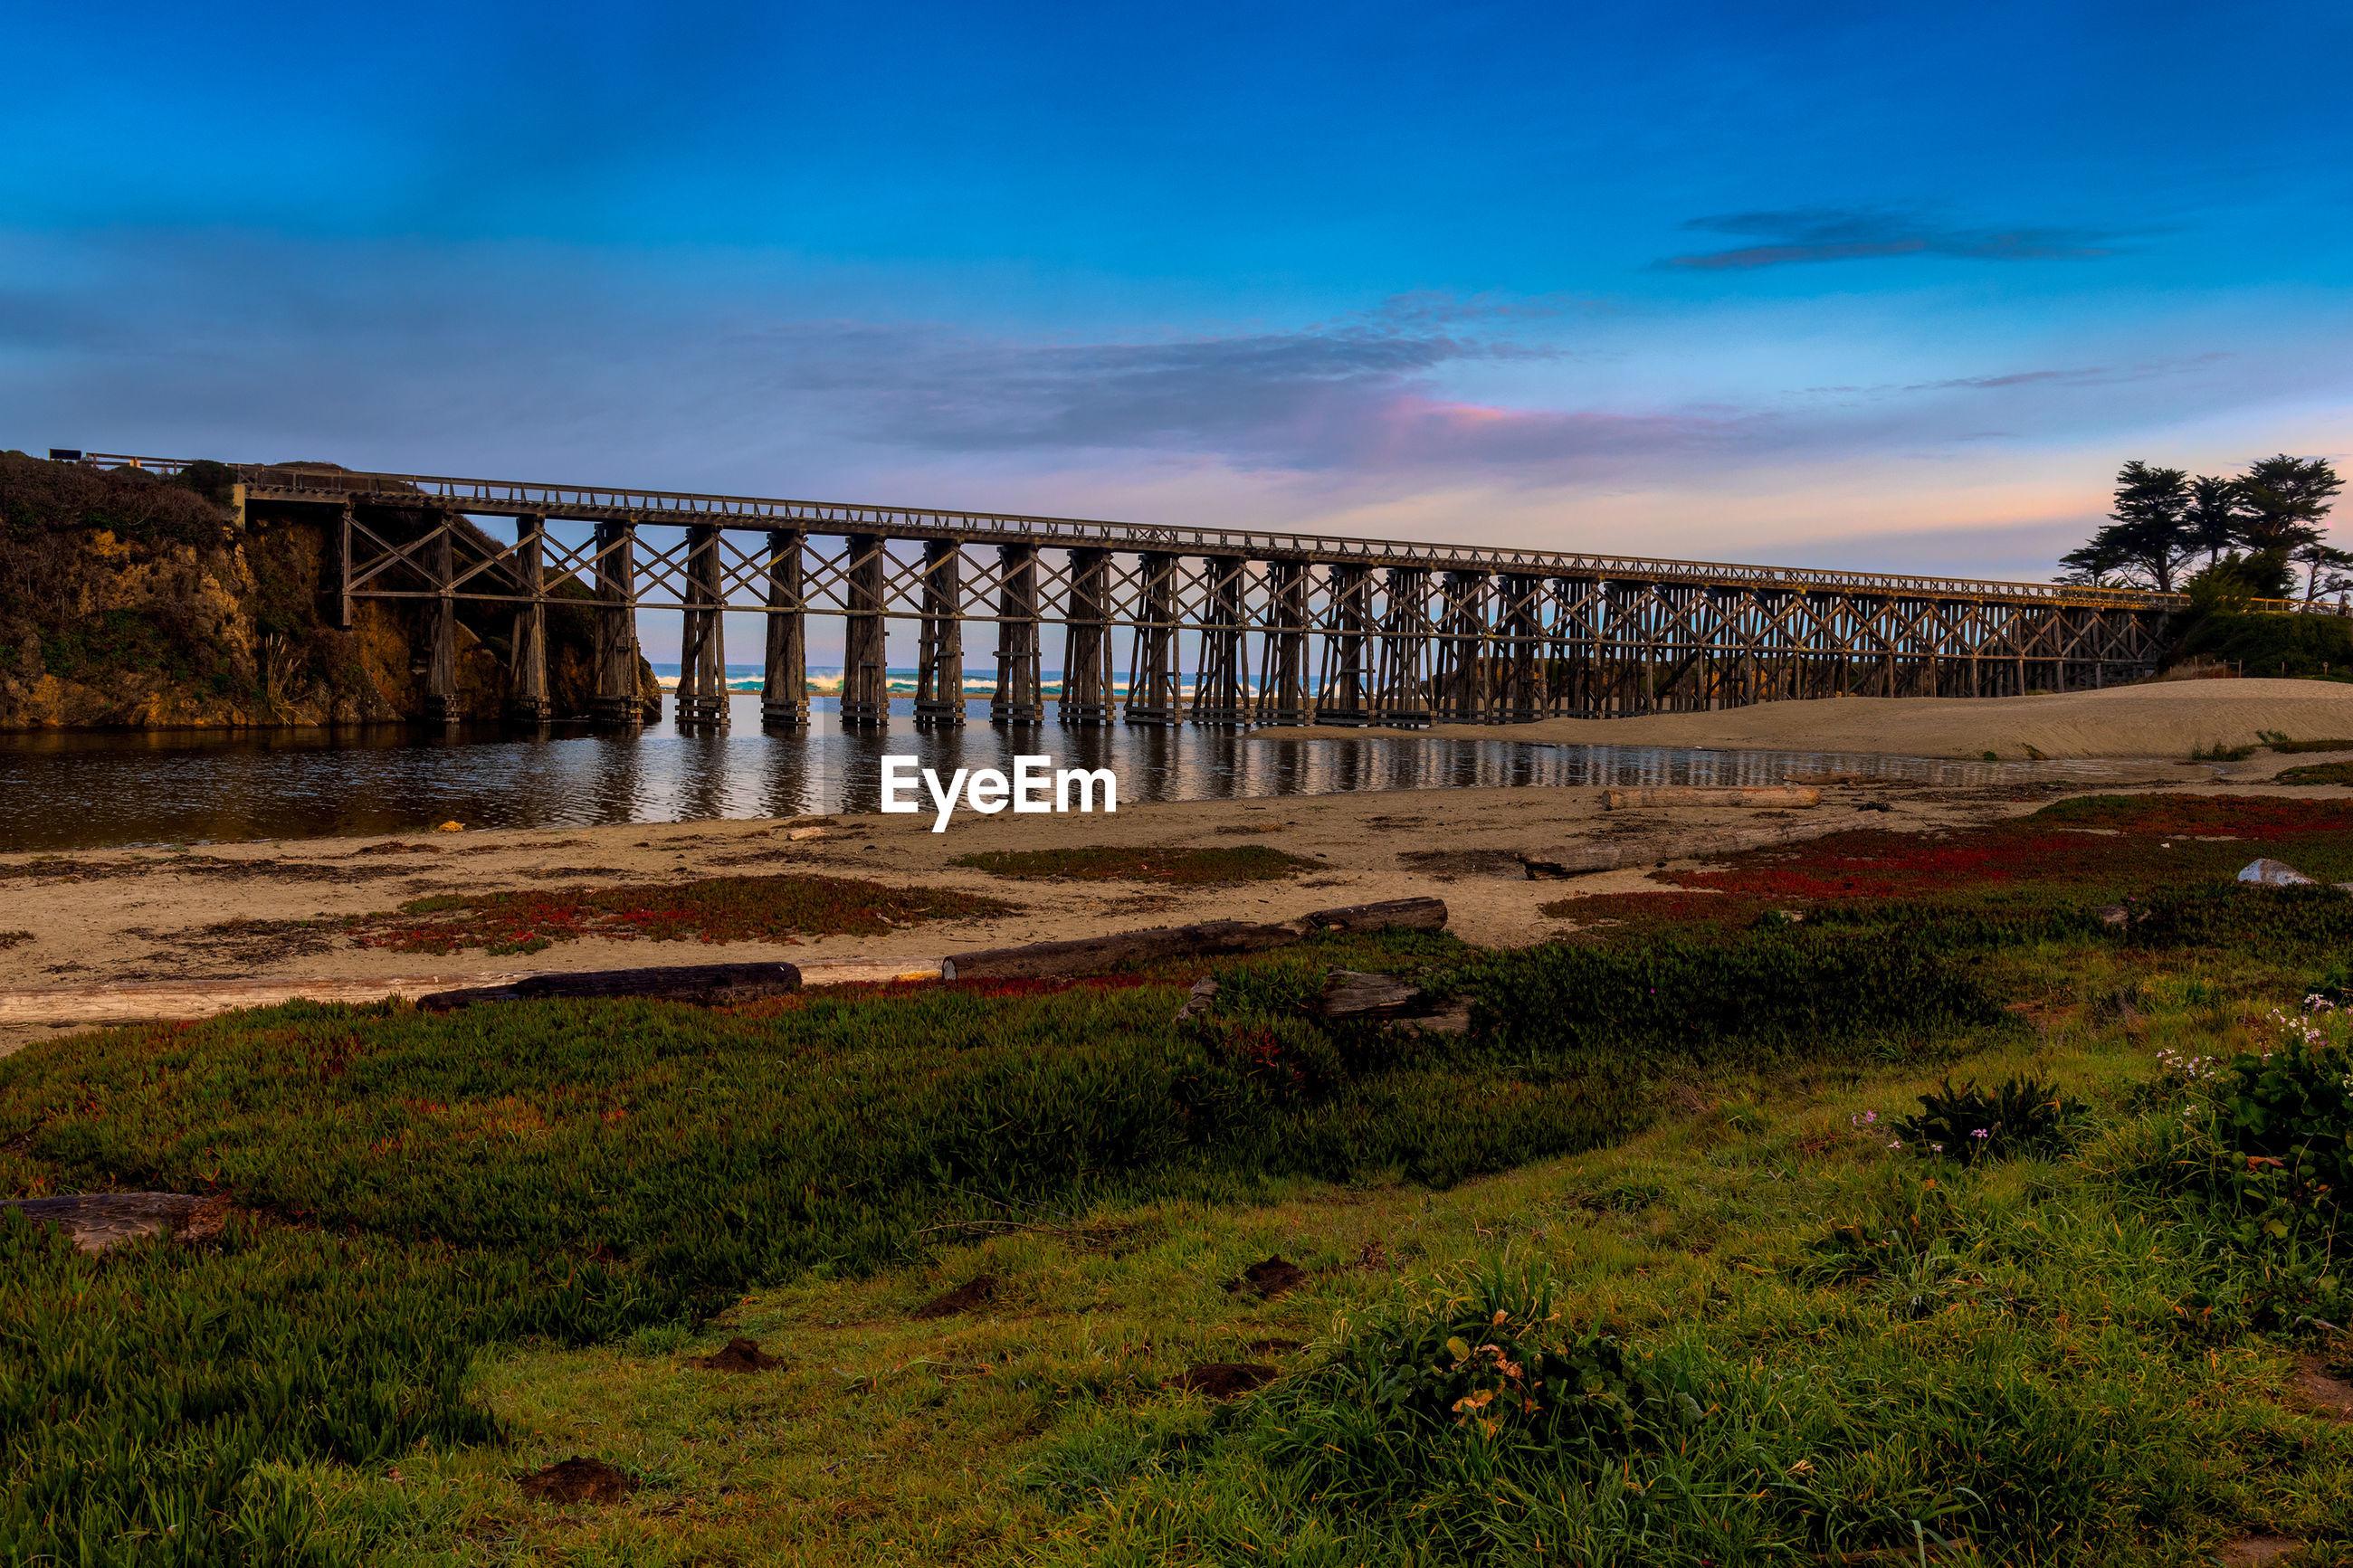 BRIDGE OVER LAND